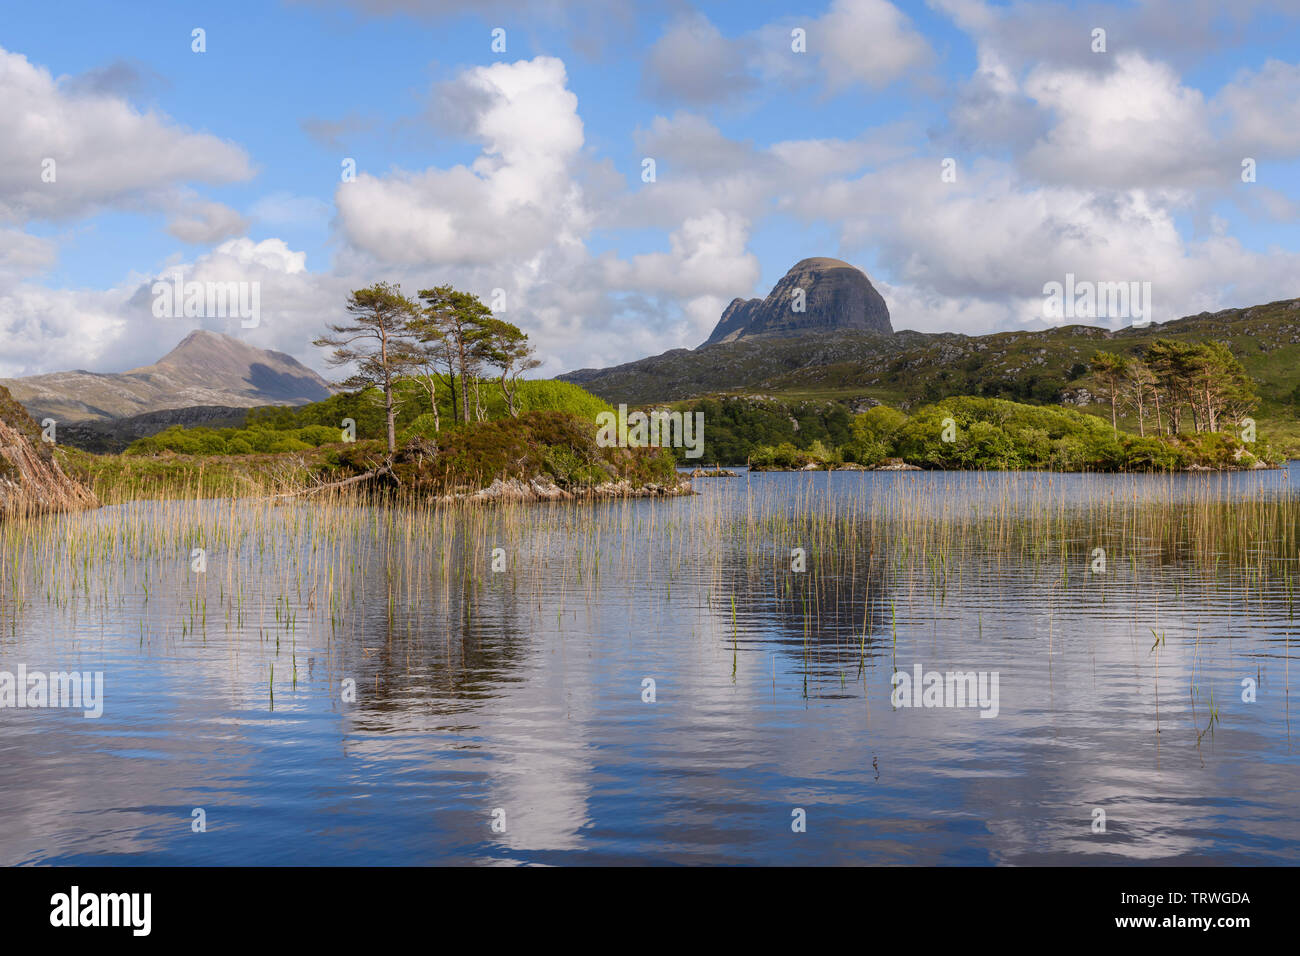 Suilven from Loch Druim Suardalain near Glencanisp Lodge, Assynt, Sutherland, Highlands, Scotland Stock Photo